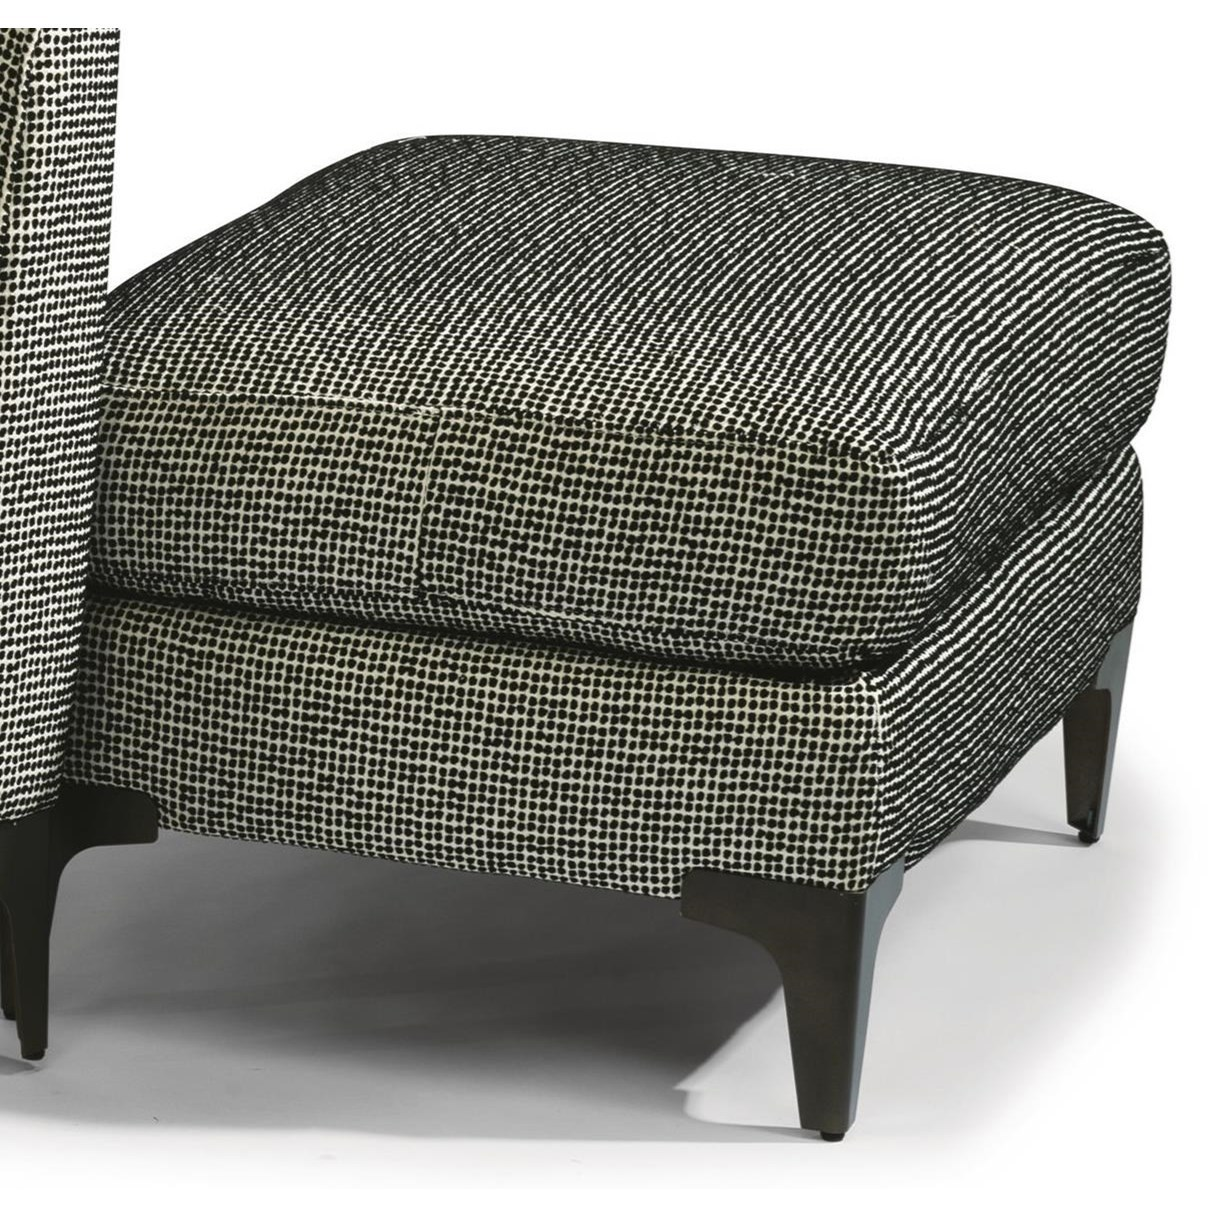 Samuel Ottoman  by Flexsteel at Furniture and ApplianceMart